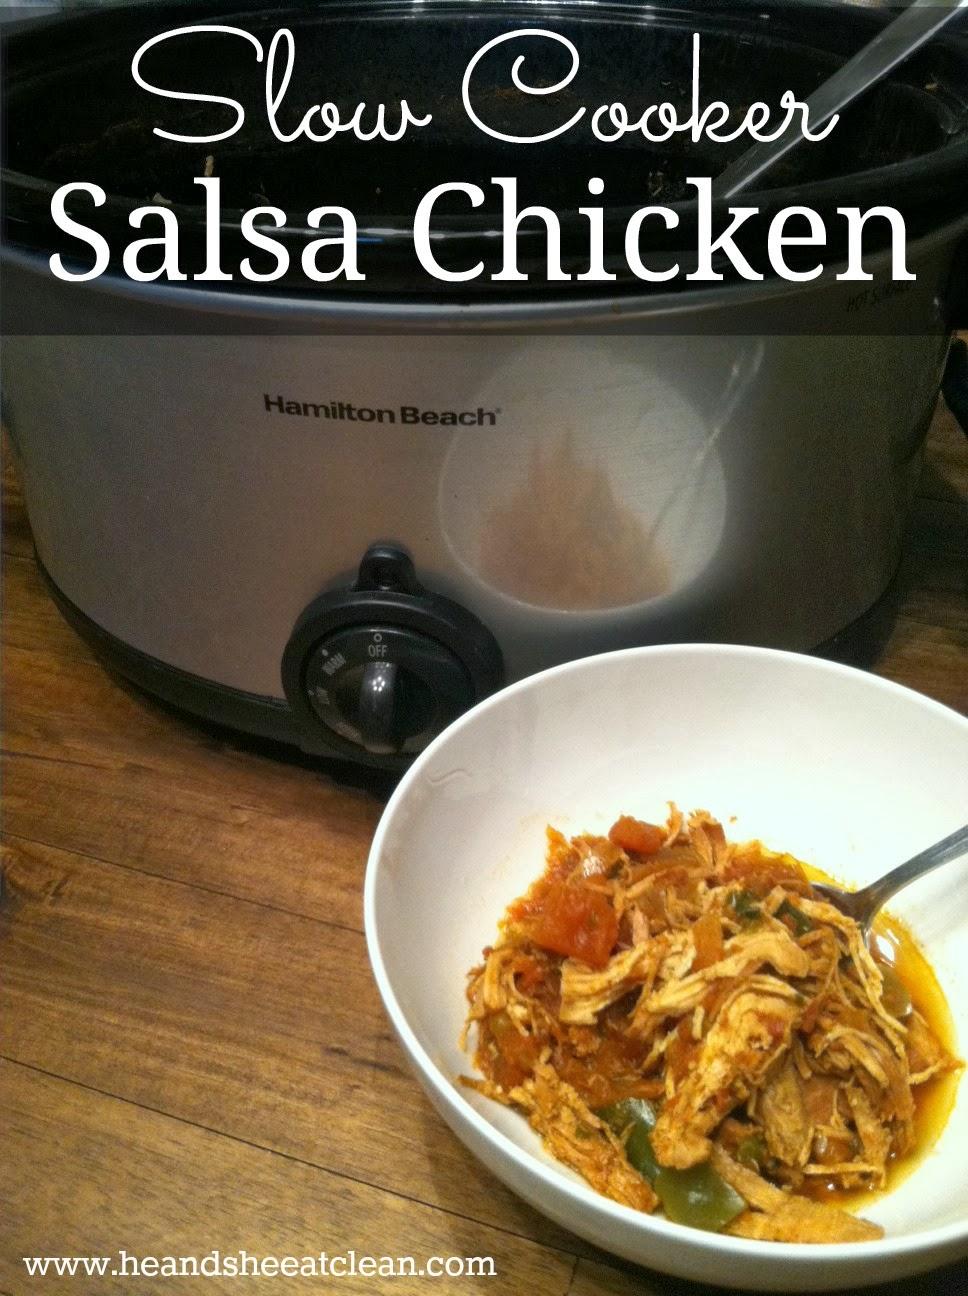 Slow-cooker-crock-pot-pulled-chicken-breast-easy-to-make-eat-clean-paleo-gluten-free-he-she-recipe-dinner-week-night-meal-weekly-food-prep-salsa-chicken.jpg